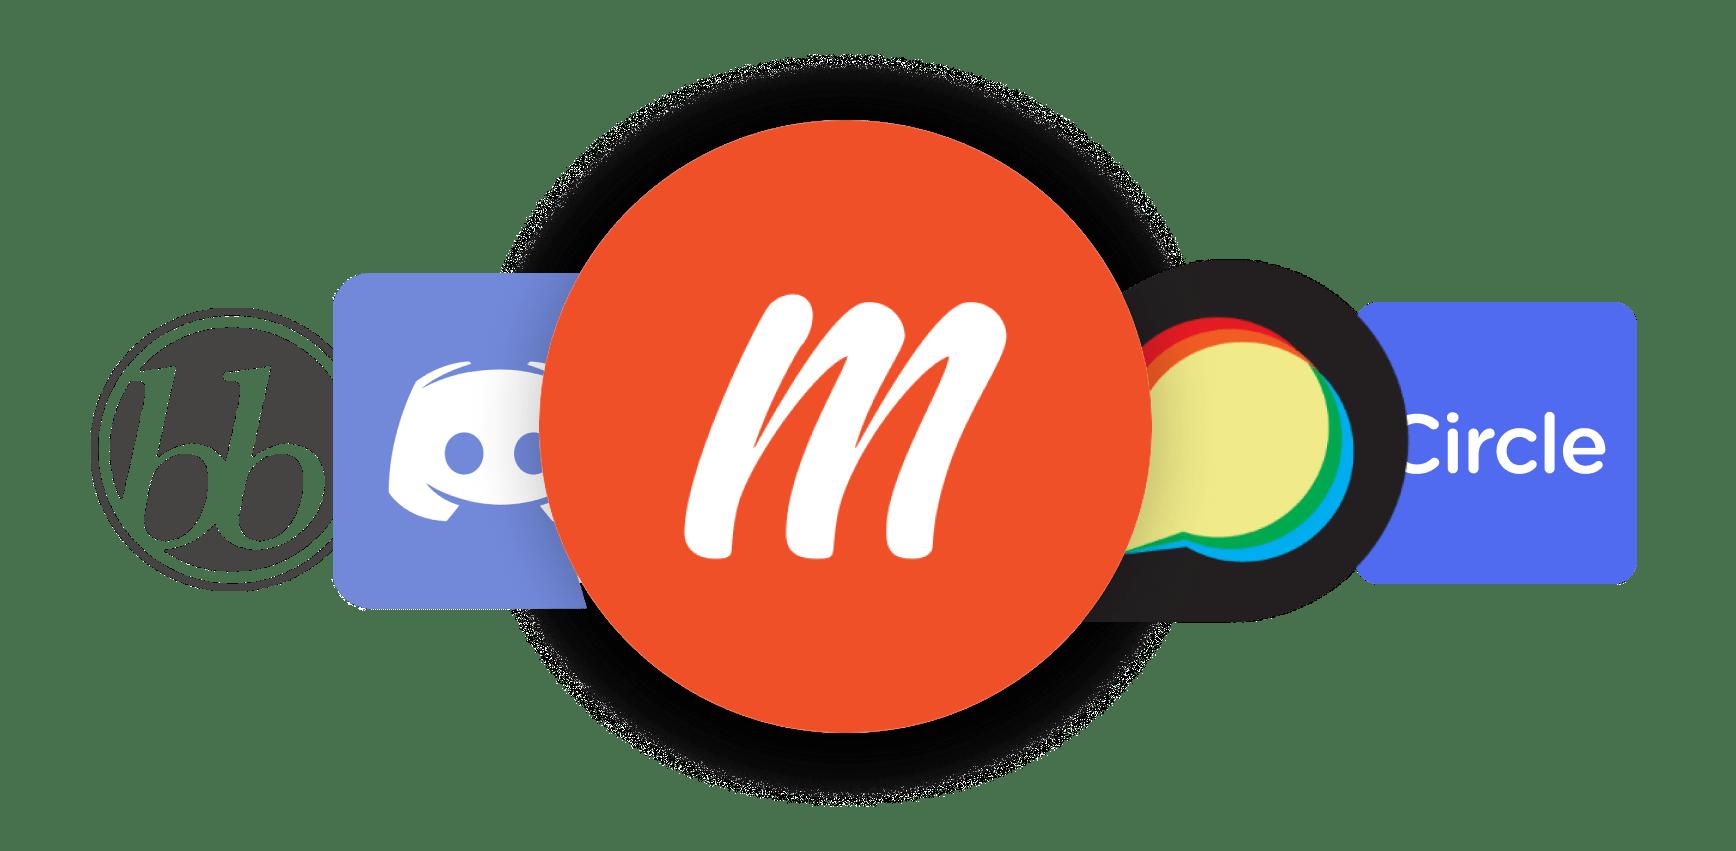 Memberful logo in front of Discourse logo, Discord logo, bbPress logo, and Circle logo